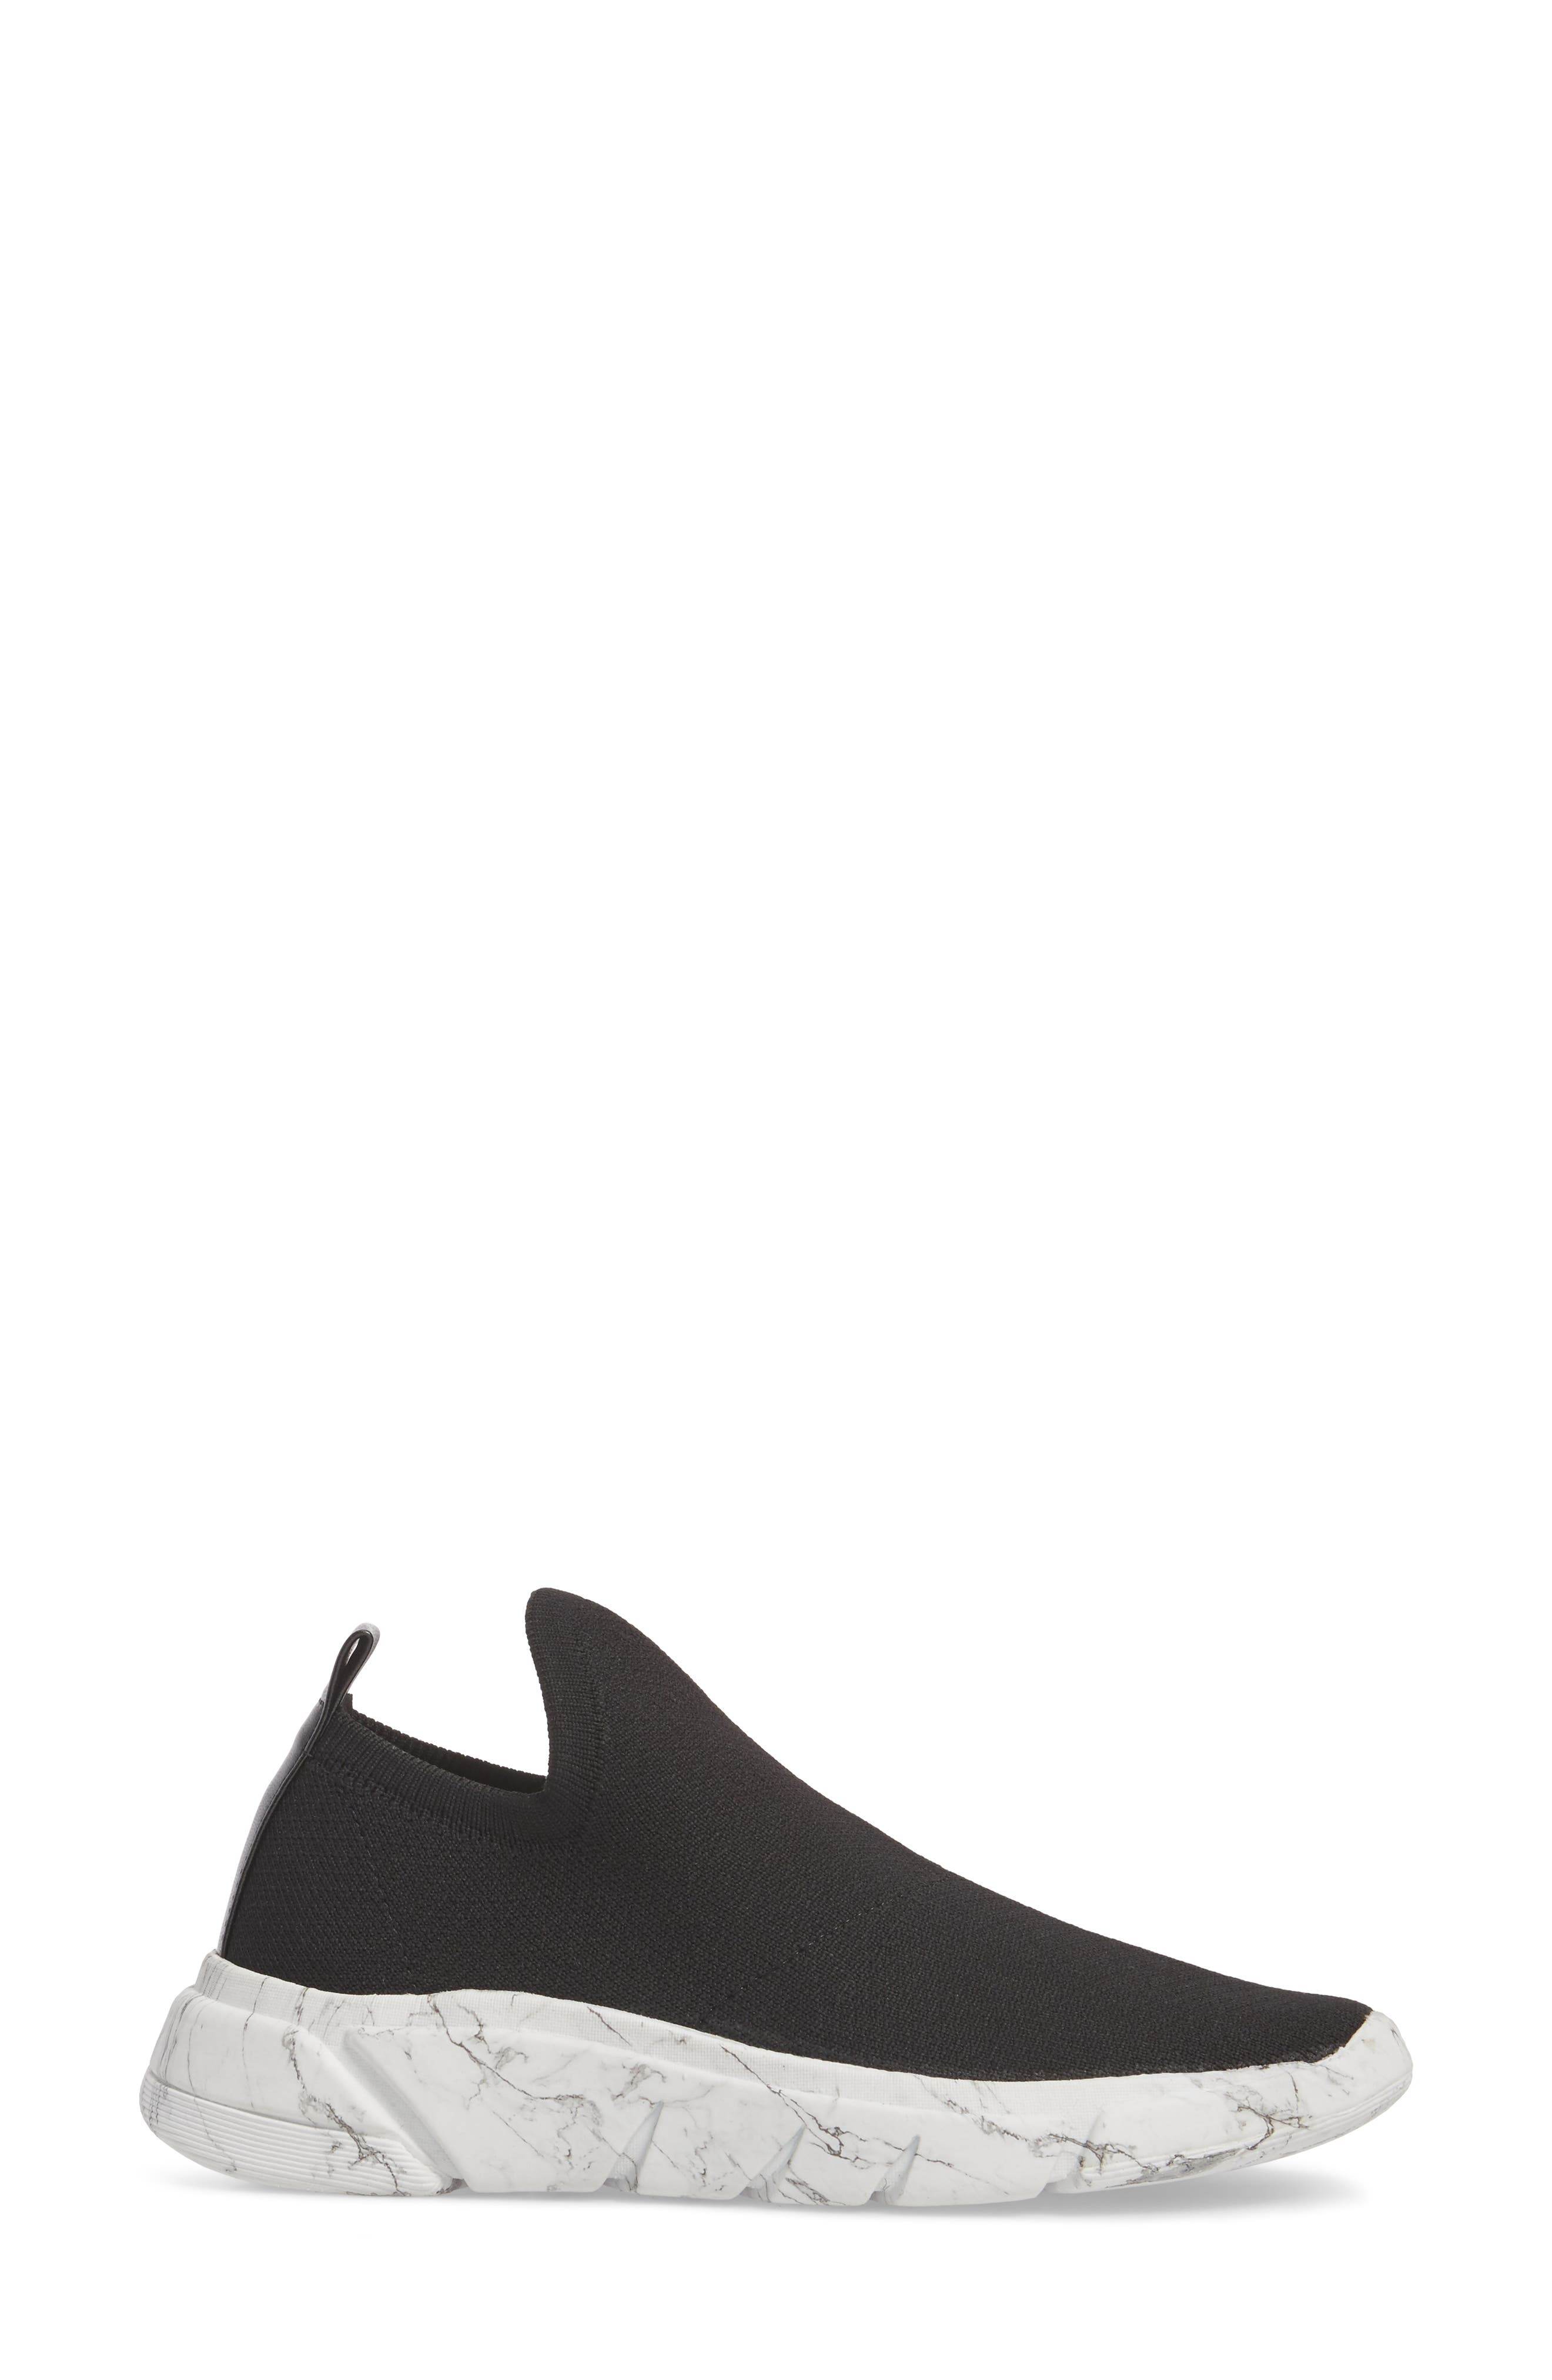 Caleb Knit Sneaker,                             Alternate thumbnail 3, color,                             BLACK